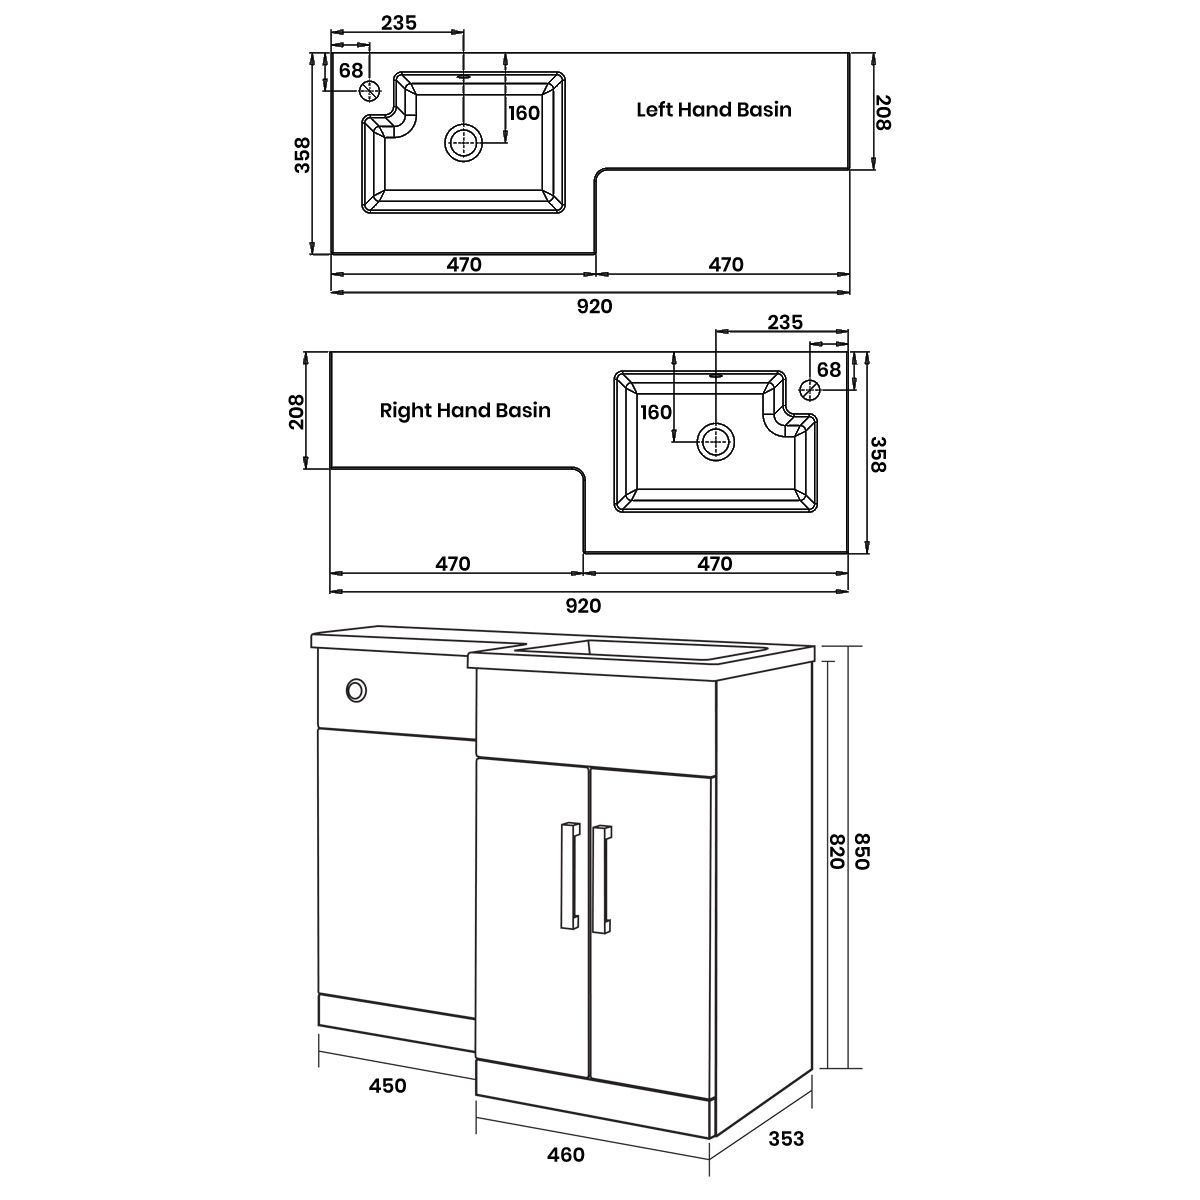 Elation Compact Combination L Shape Bodega Grey Furniture Pack 920mm Dimensions